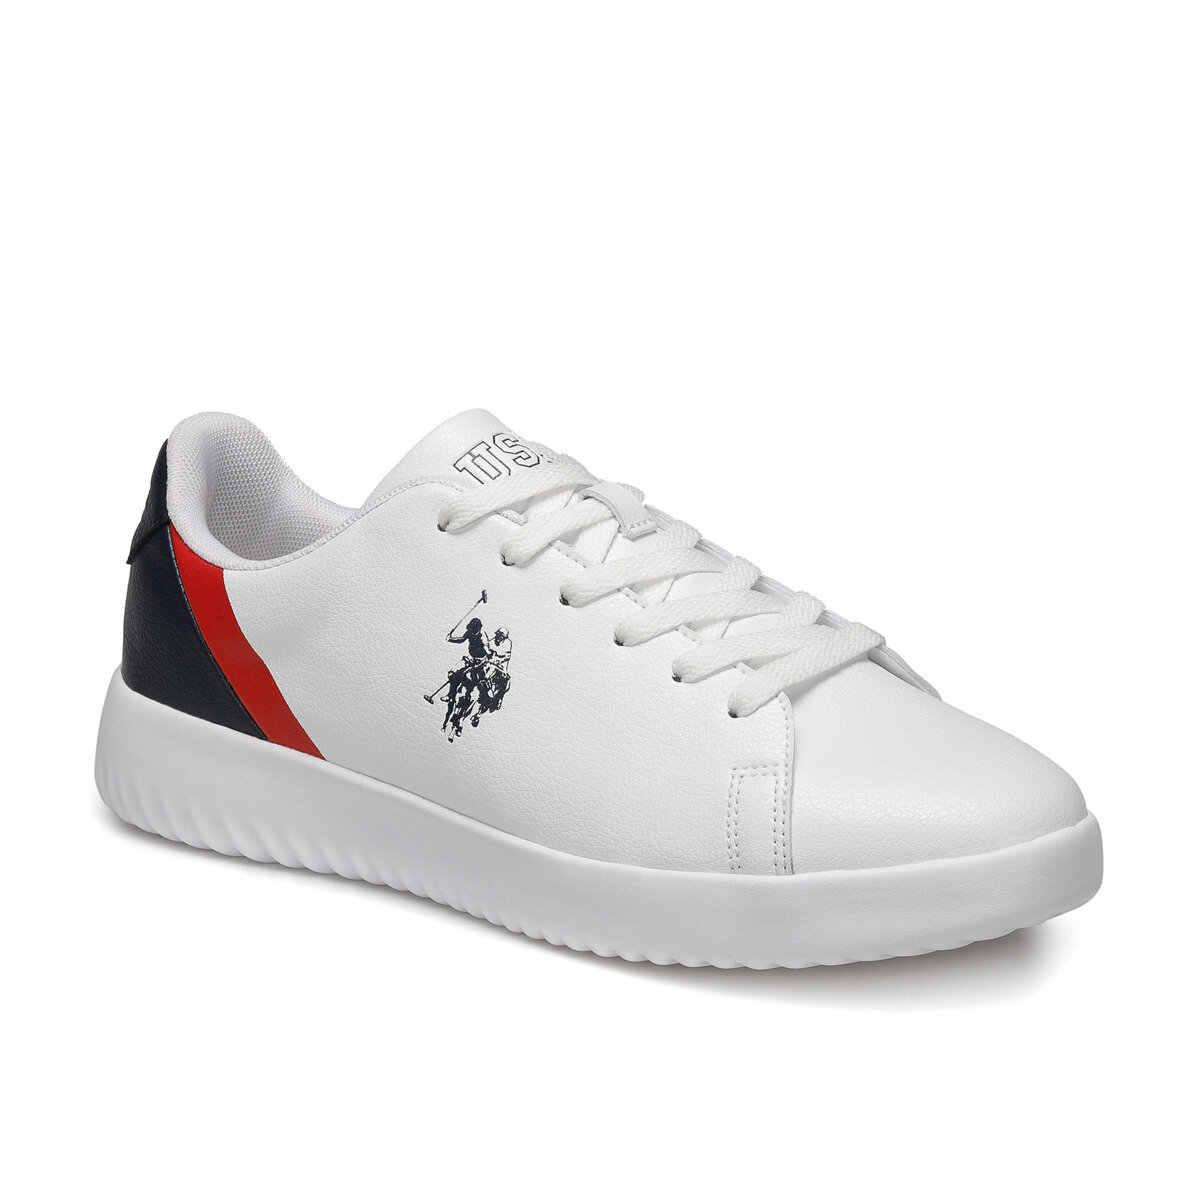 FLO PROSS White Men 'S Sneaker Shoes U